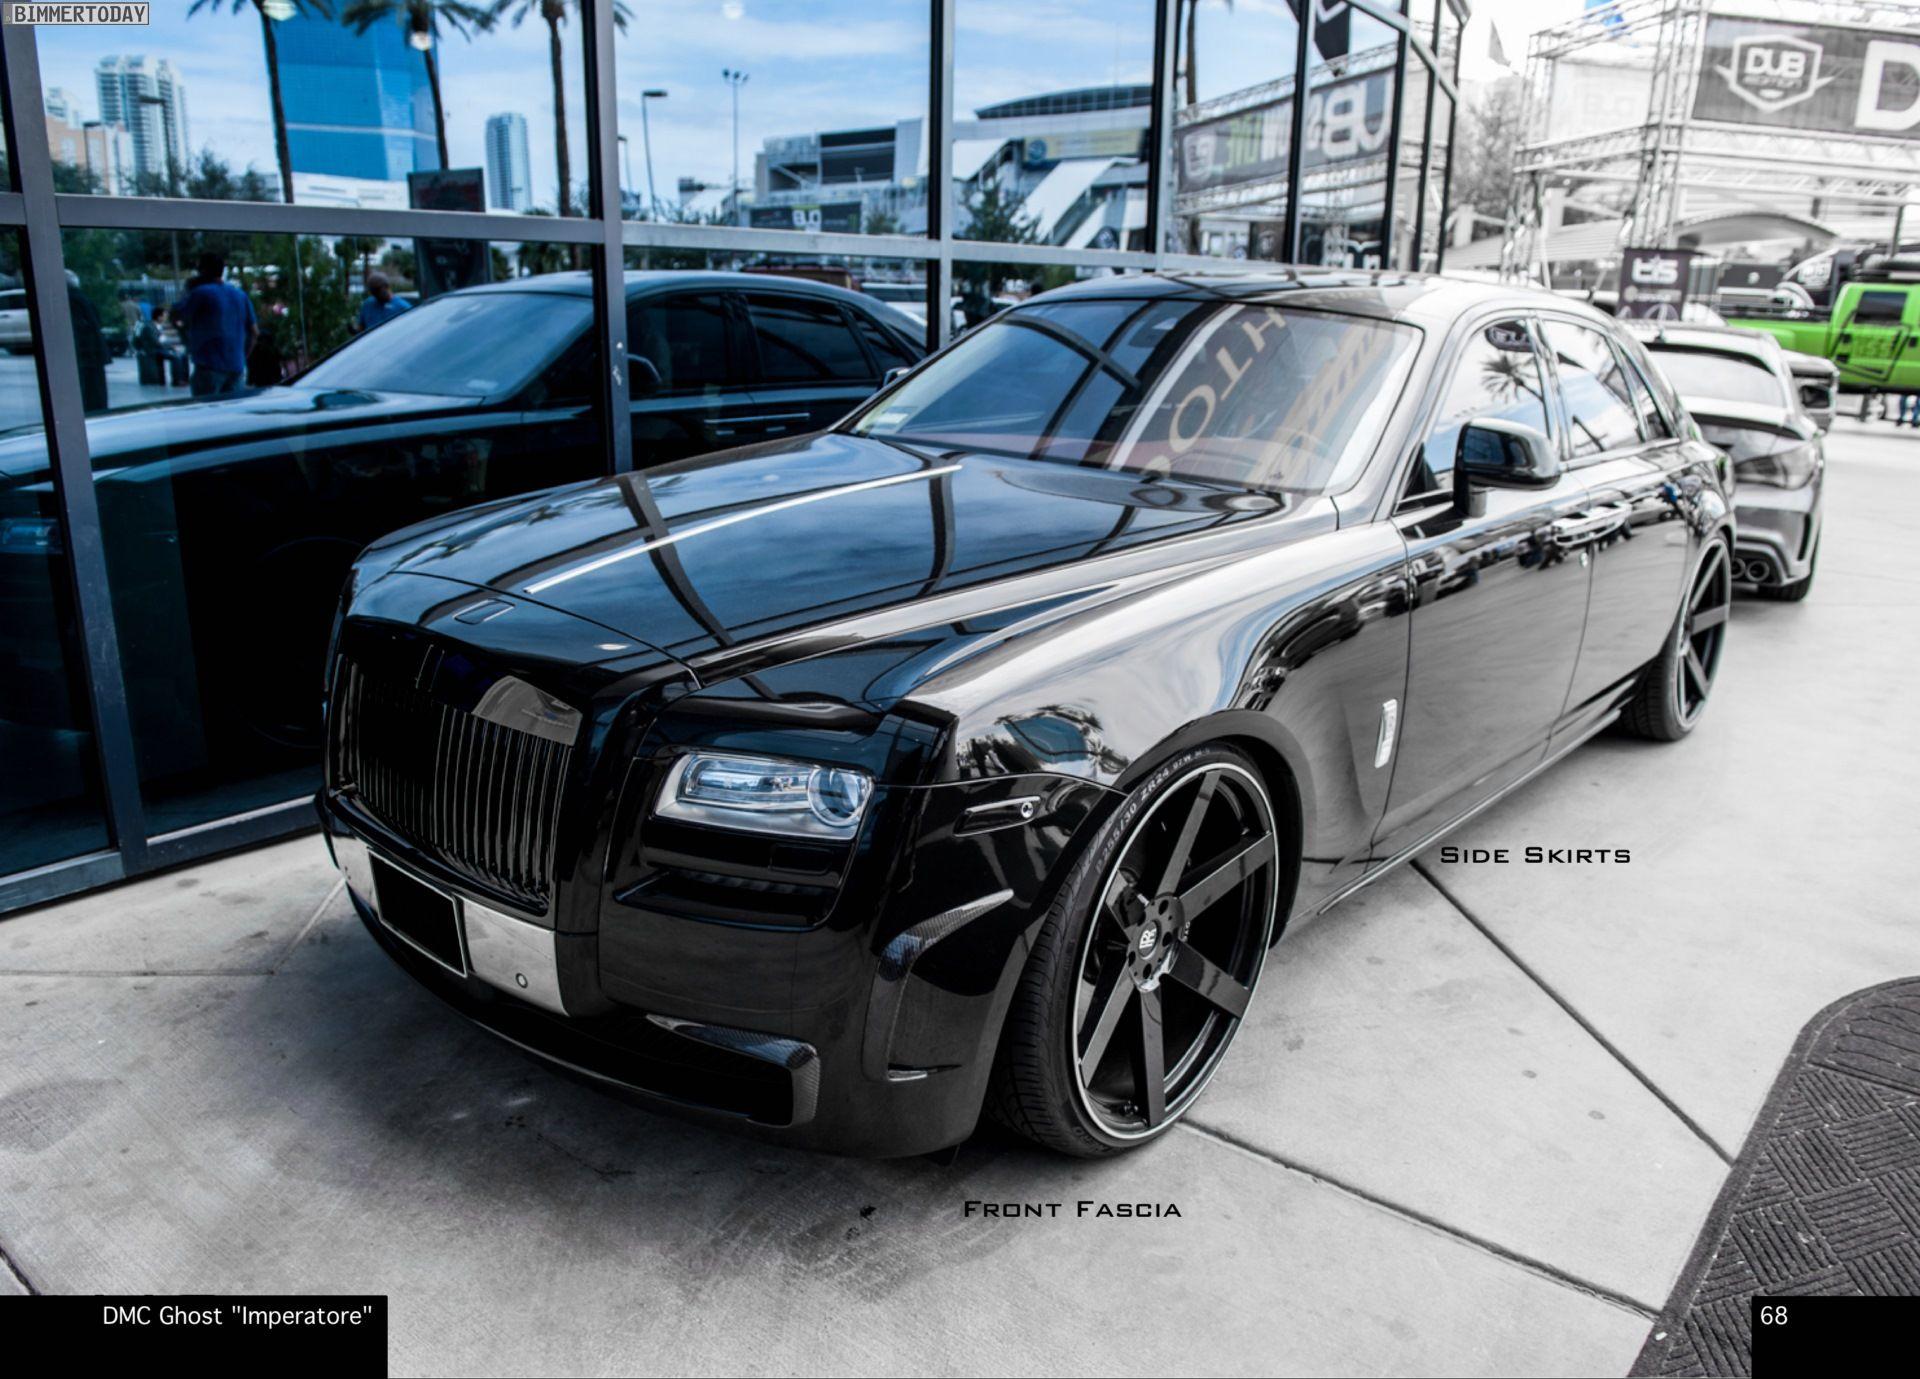 DMC-Luxury-Rolls-Royce-Ghost-Imperatore-Tuning-01